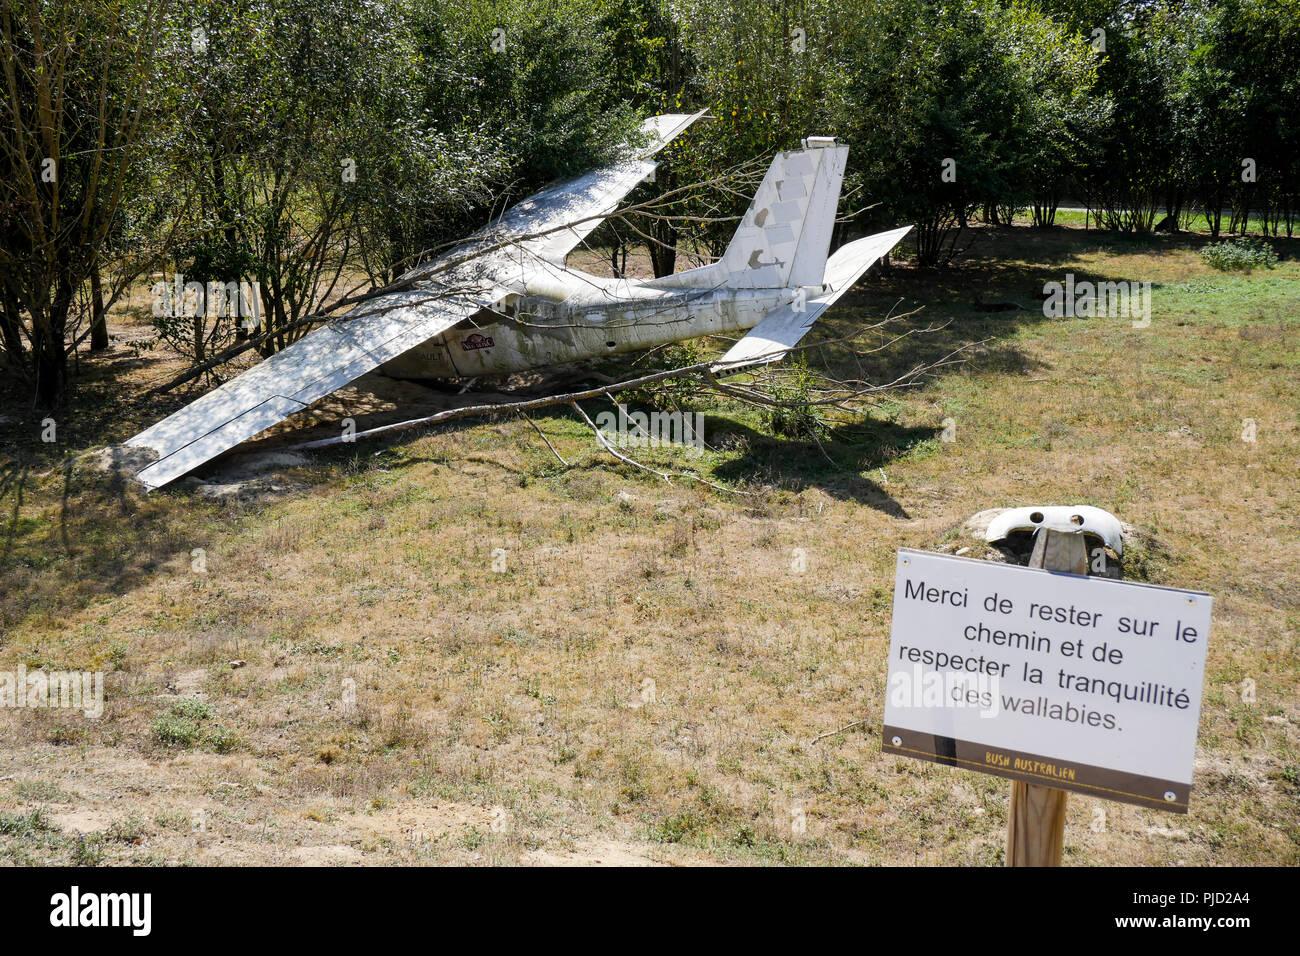 Crashed plane, Birds Park, Villars Les Dombes, France - Stock Image